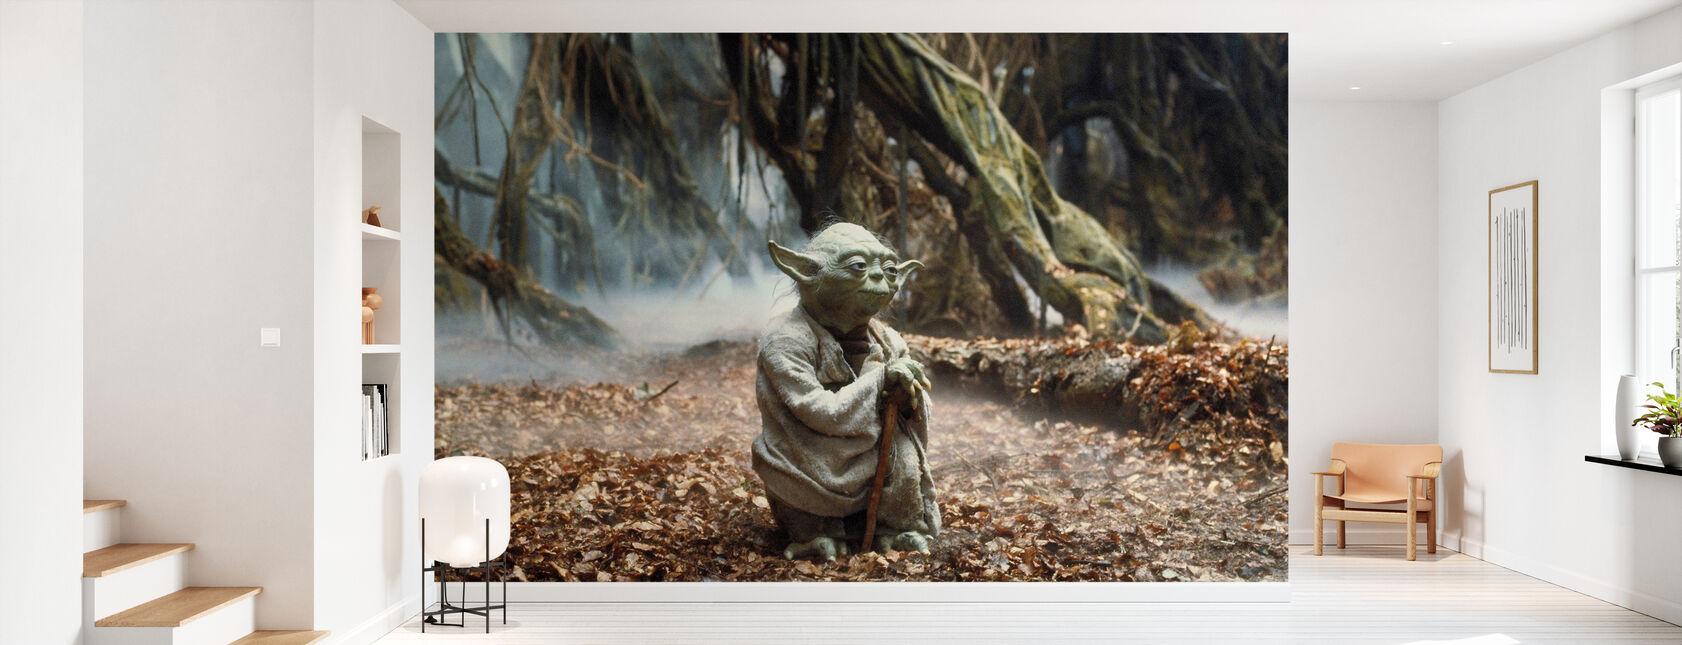 Stjärnornas krig - Yoda Dagobah 2 - Tapet - Hall